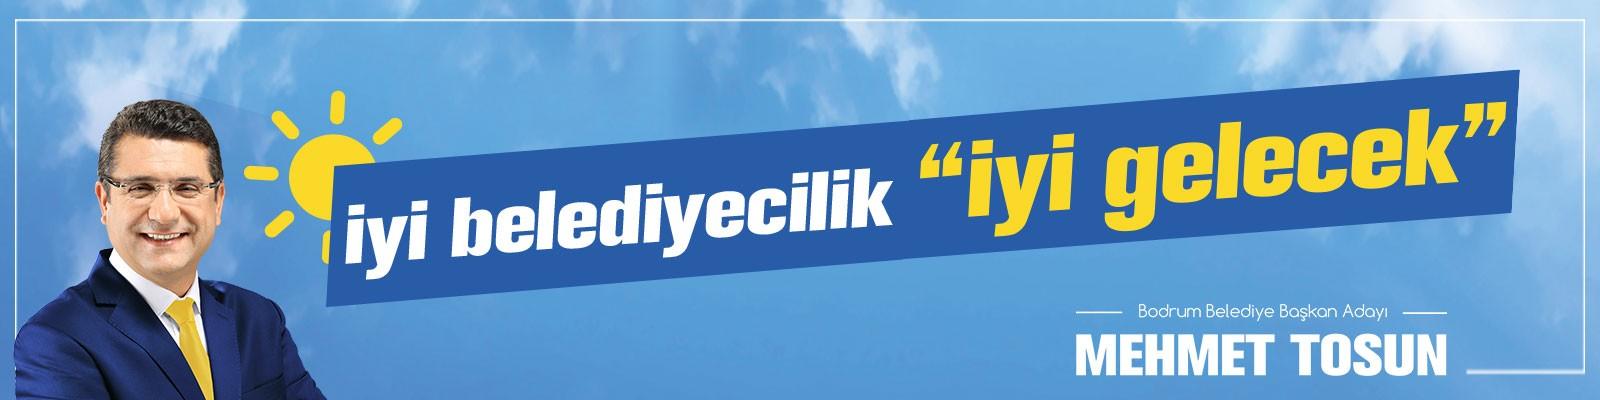 bodrum dto BODRUMLU DENİZCİLER PARİS BOAT SHOW'DA… mehmet tosun banner 1